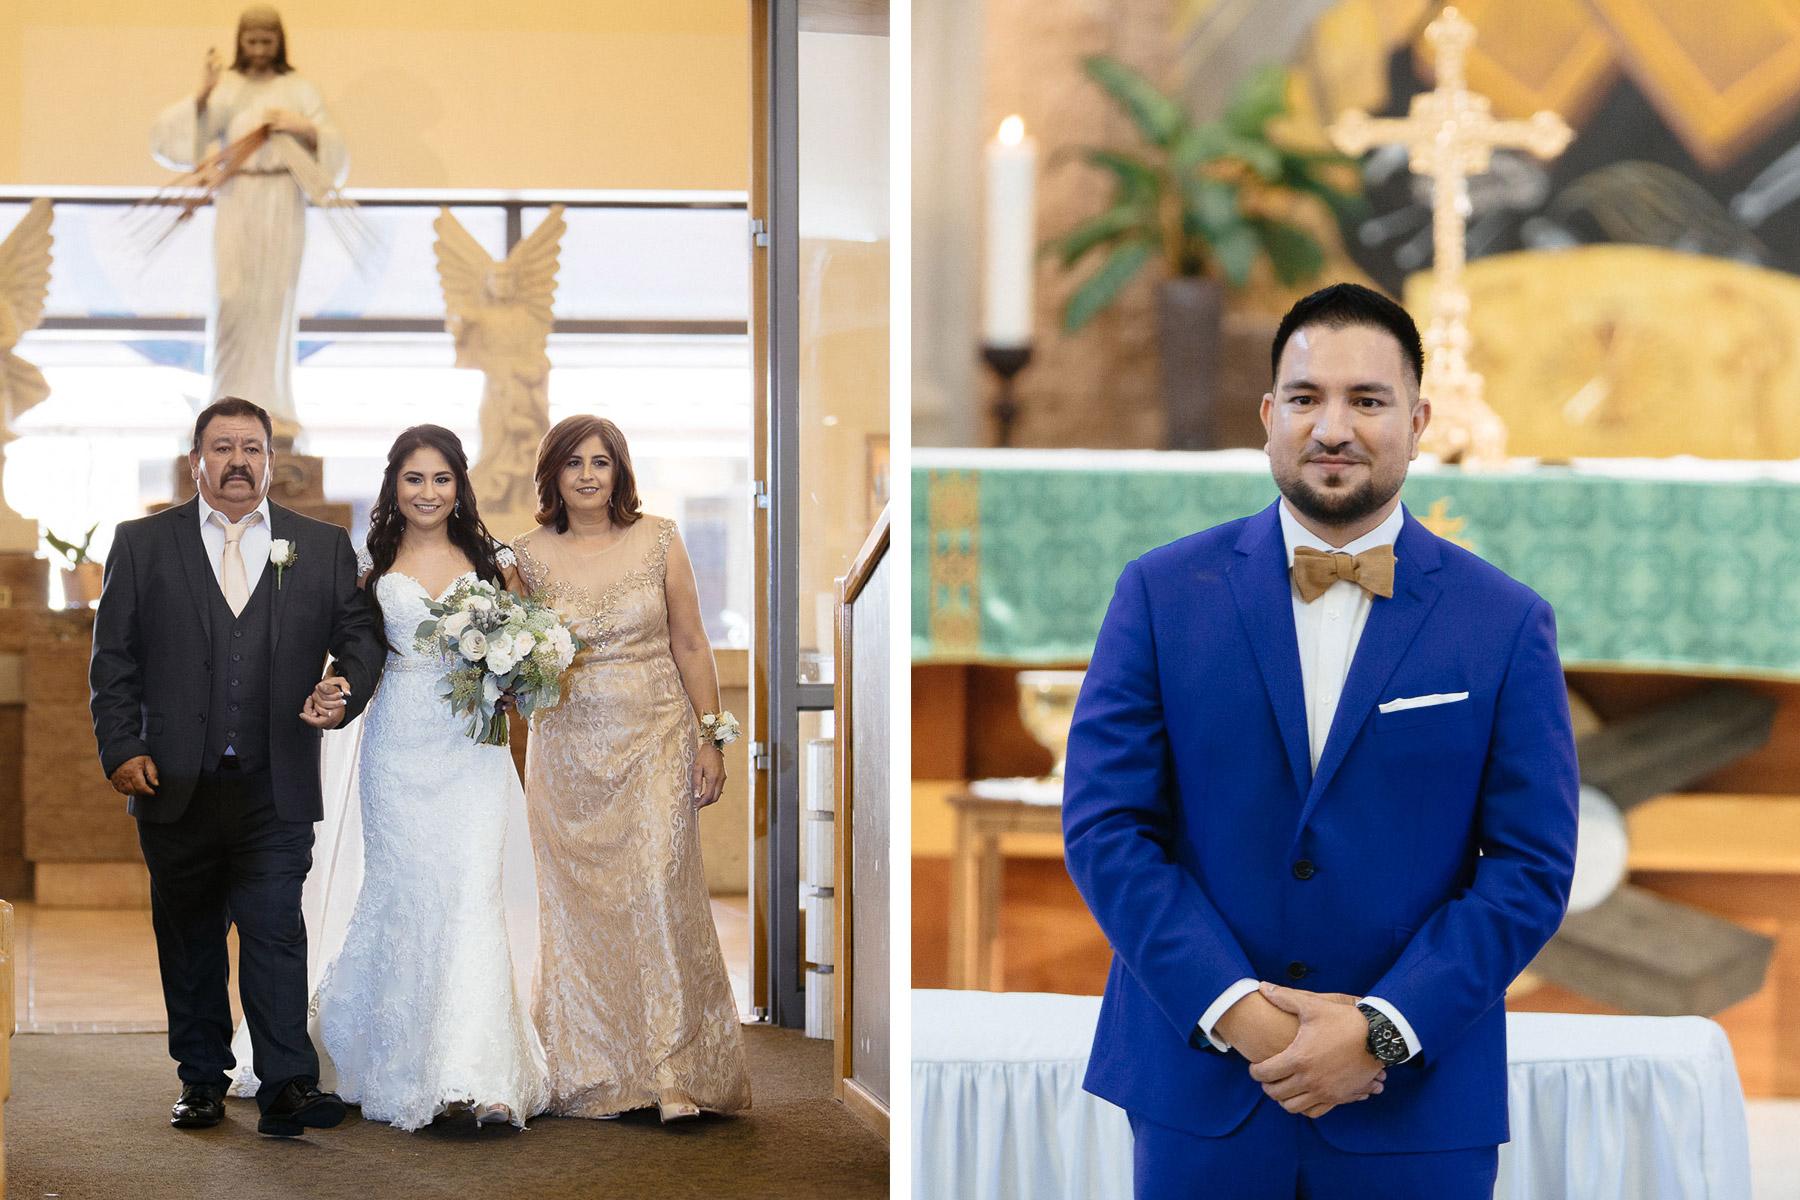 161029-Luxium-Weddings-Arizona-Jeff-Griselda-First-Look-Val-Vista-Lakes-Gilber-032a.jpg